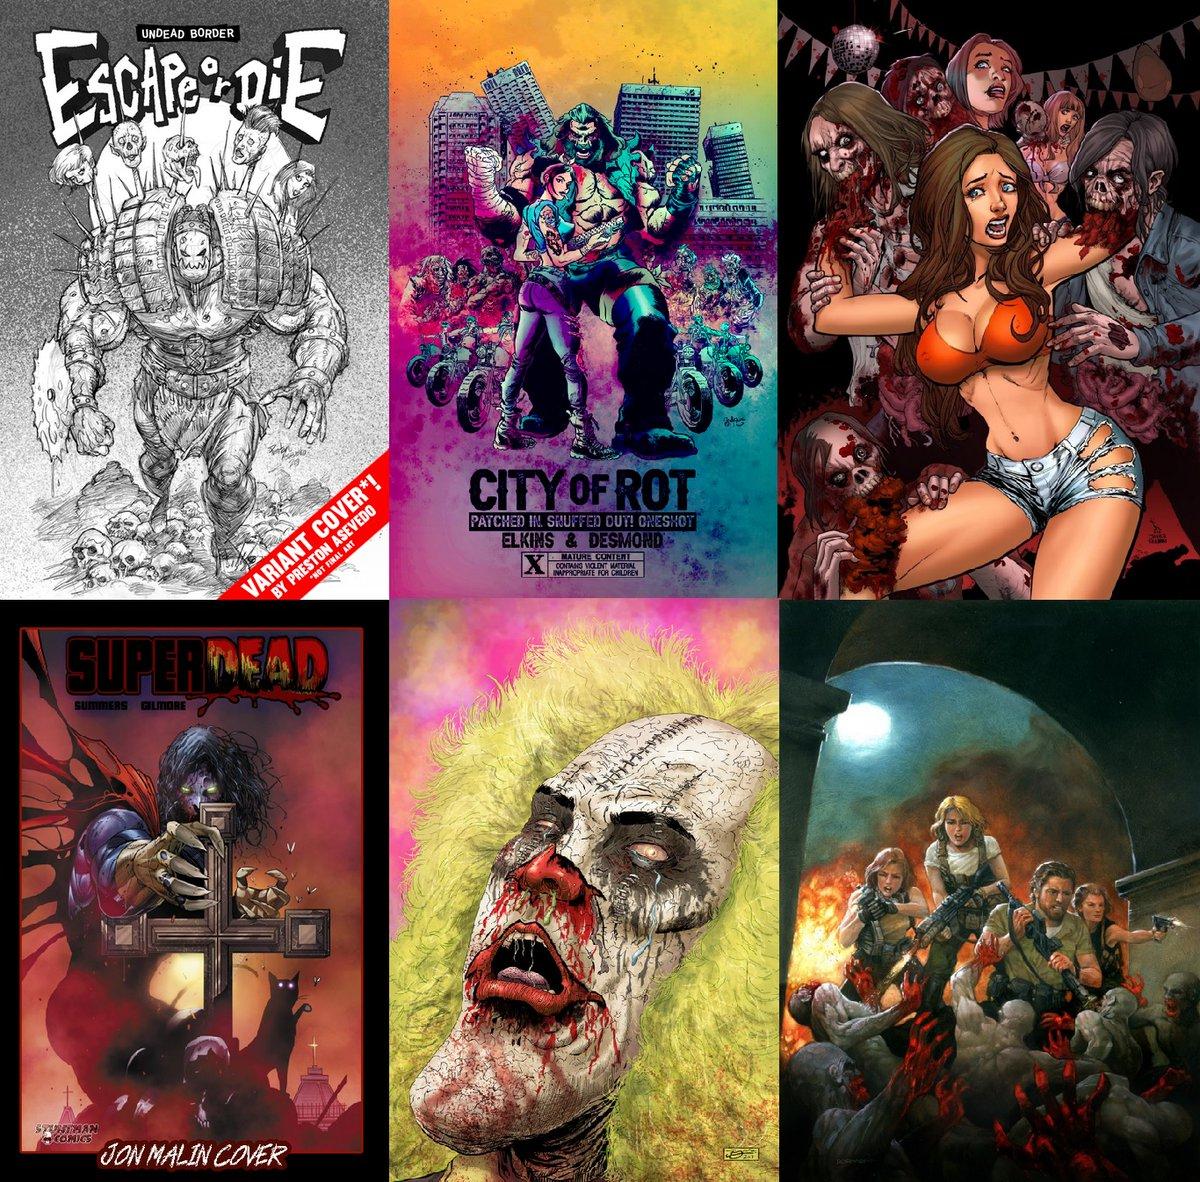 Escape or Die  https://t.co/q8WBXWi3zR  City of Rot https://t.co/mXyMUt5H2U  CotD: Graduation Day https://t.co/DjgGtPuvNj  Super Dead https://t.co/FQvqK7L7zu  Doomsday Kingdom https://t.co/9idJd6twRN  Black Tide Rising https://t.co/hy2ScXWizn  #Zombie #Horror #ComicsForEveryone https://t.co/3TvgCYA5BD